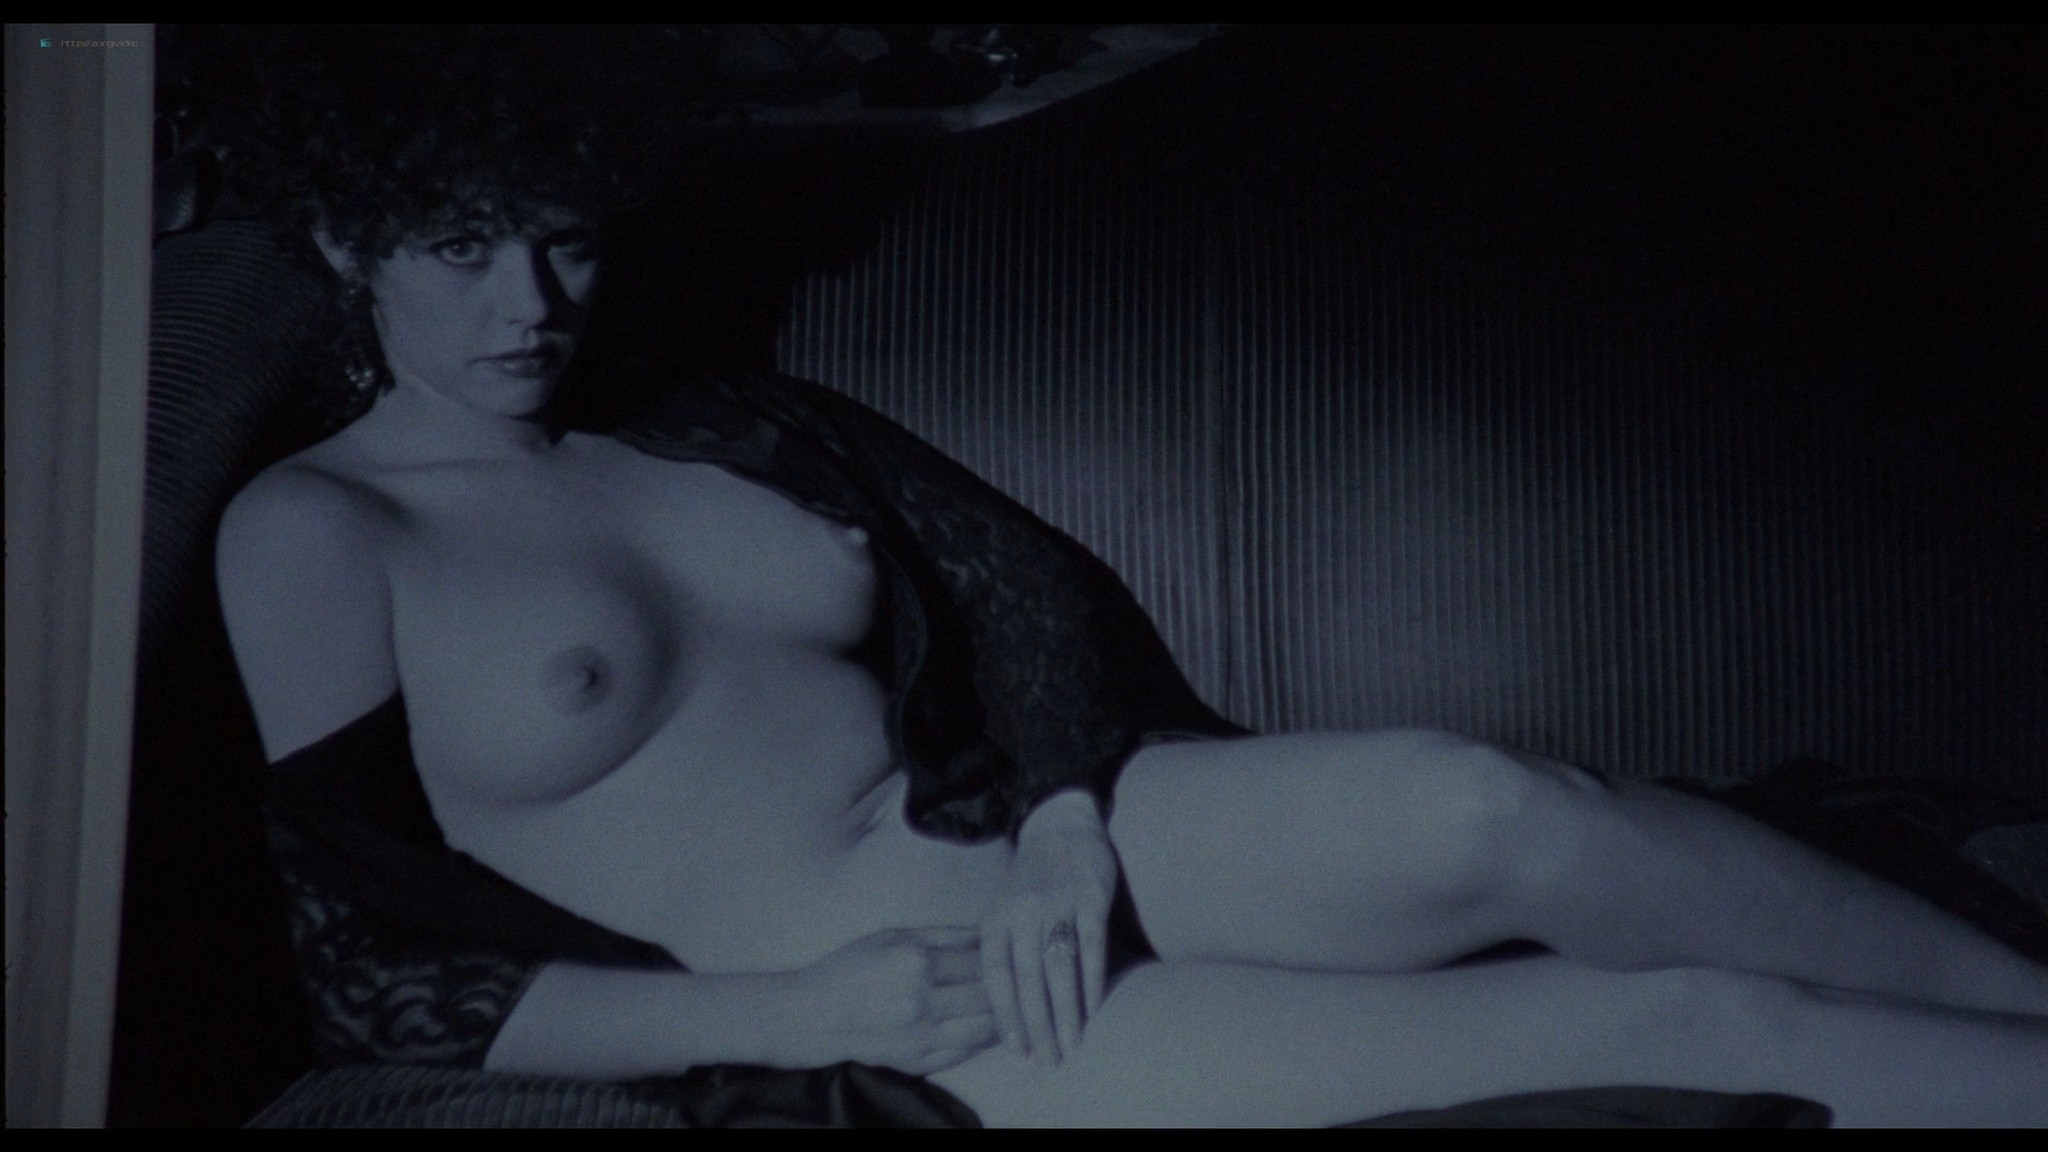 Jennifer Delora nude hot sex - Deadly Manor (1990) HD 1080p BluRay (14)